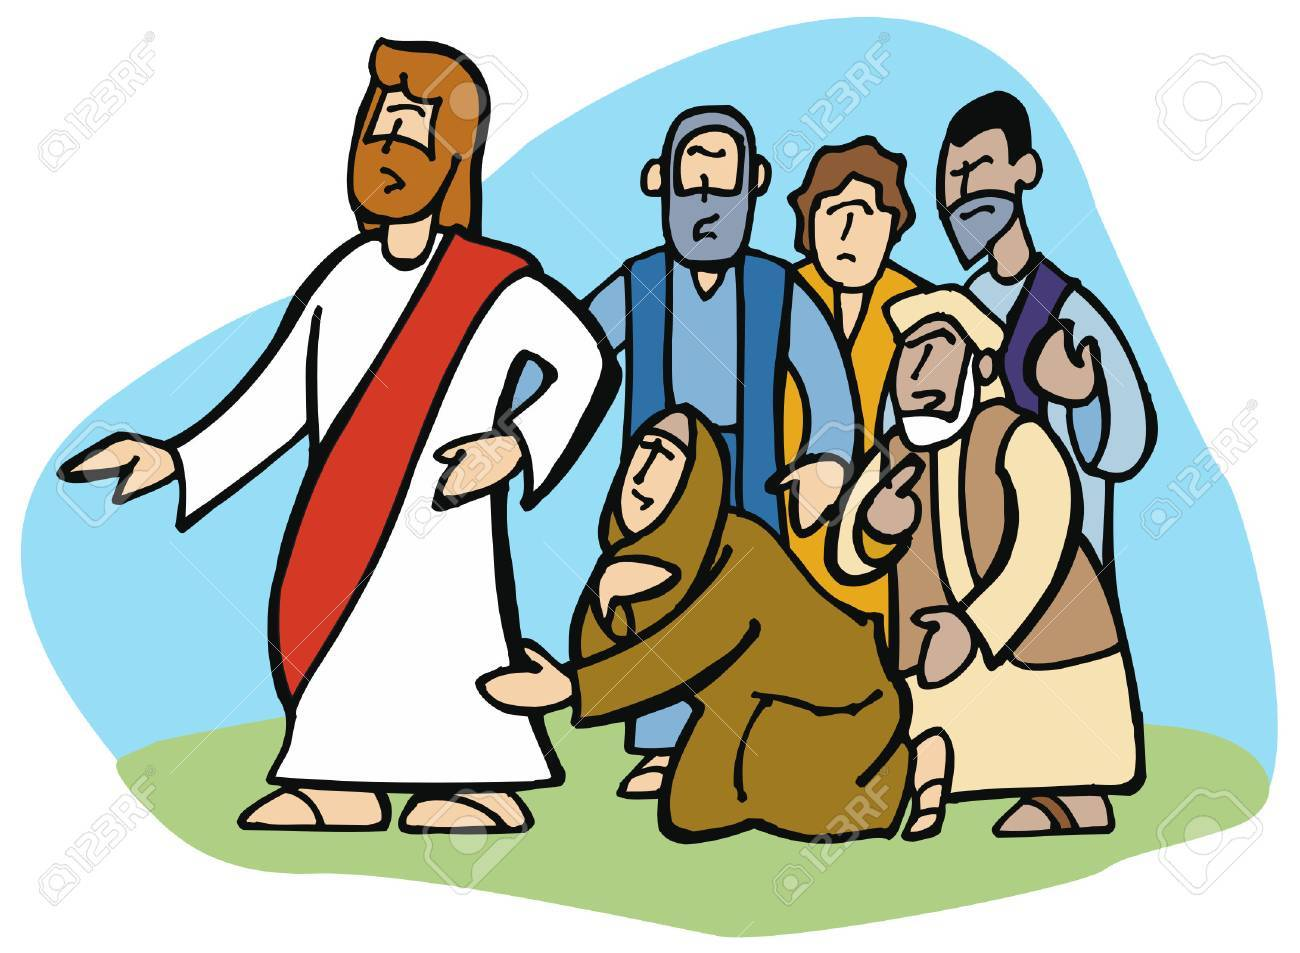 Clipart jesus healing the sick 4 » Clipart Portal.